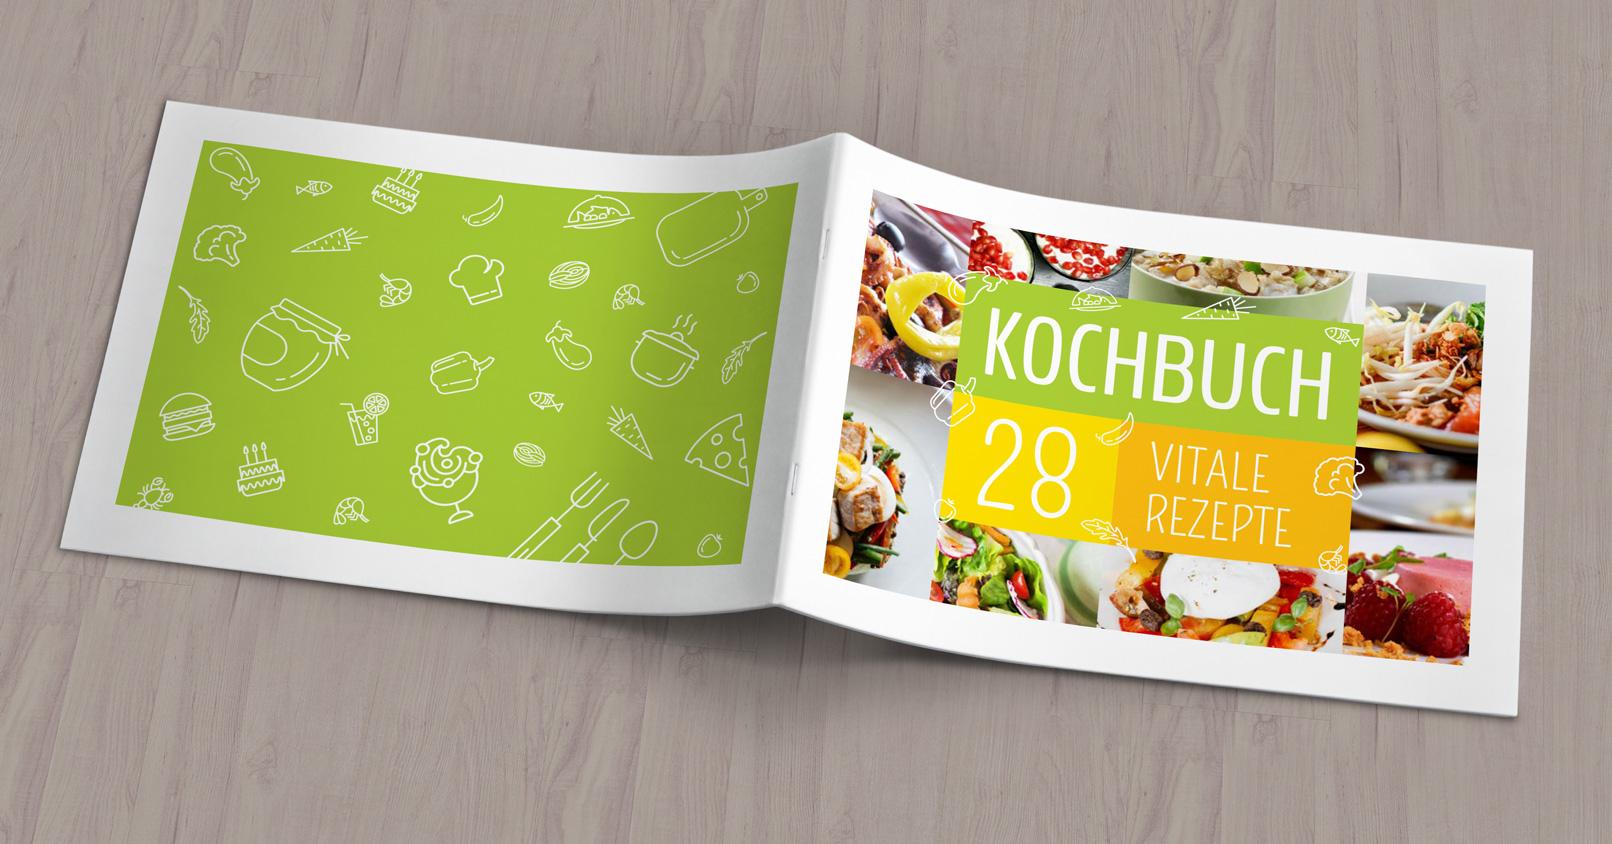 Vorlagen für Rezeptbuch, Kochbuch, Backanleitung im A4-Querformat